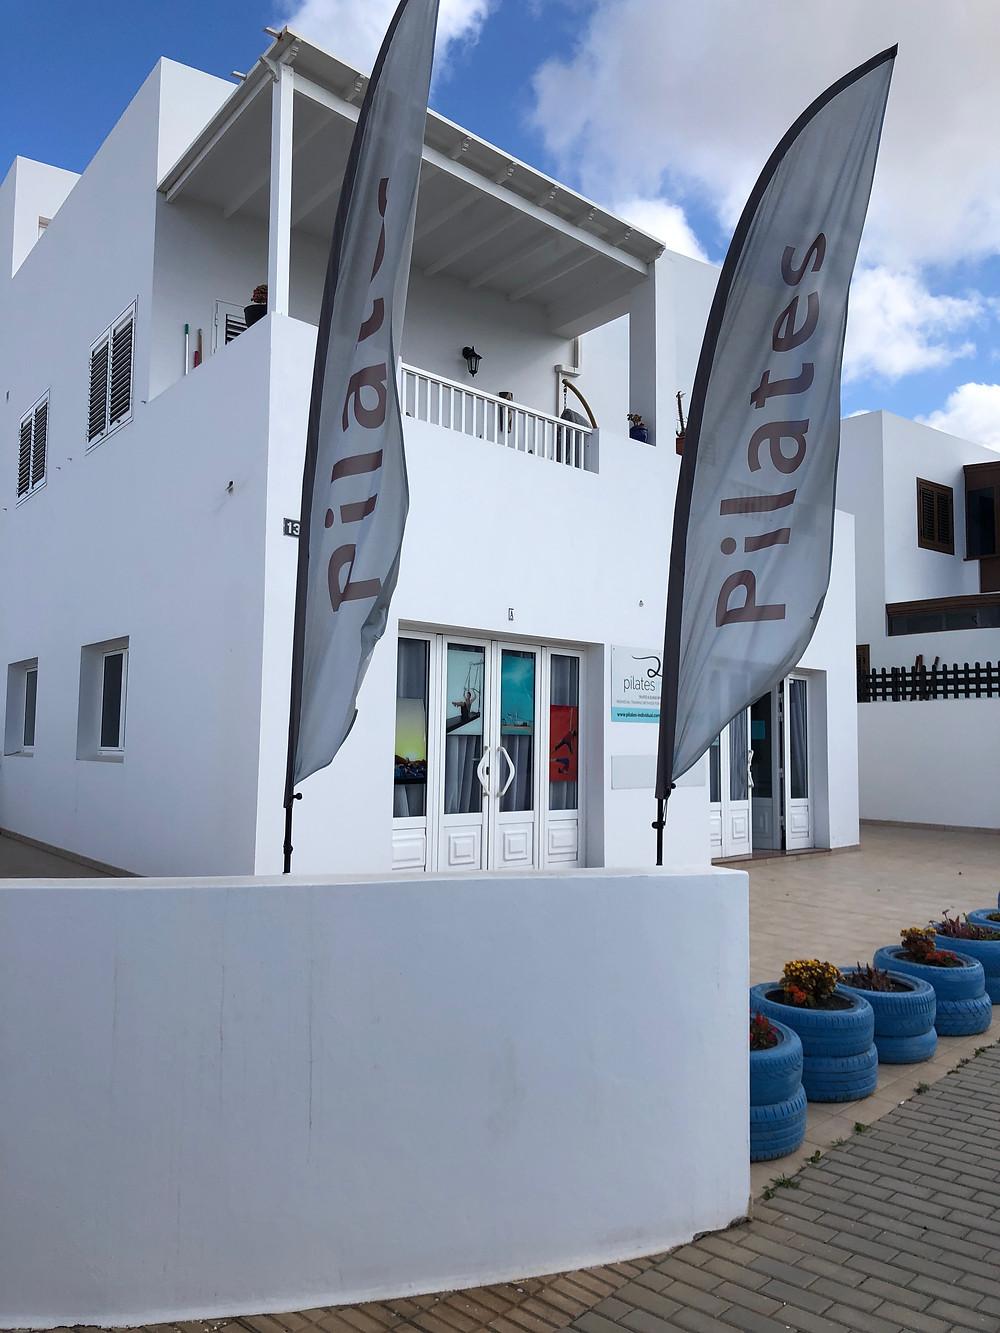 pilates Lanzarote